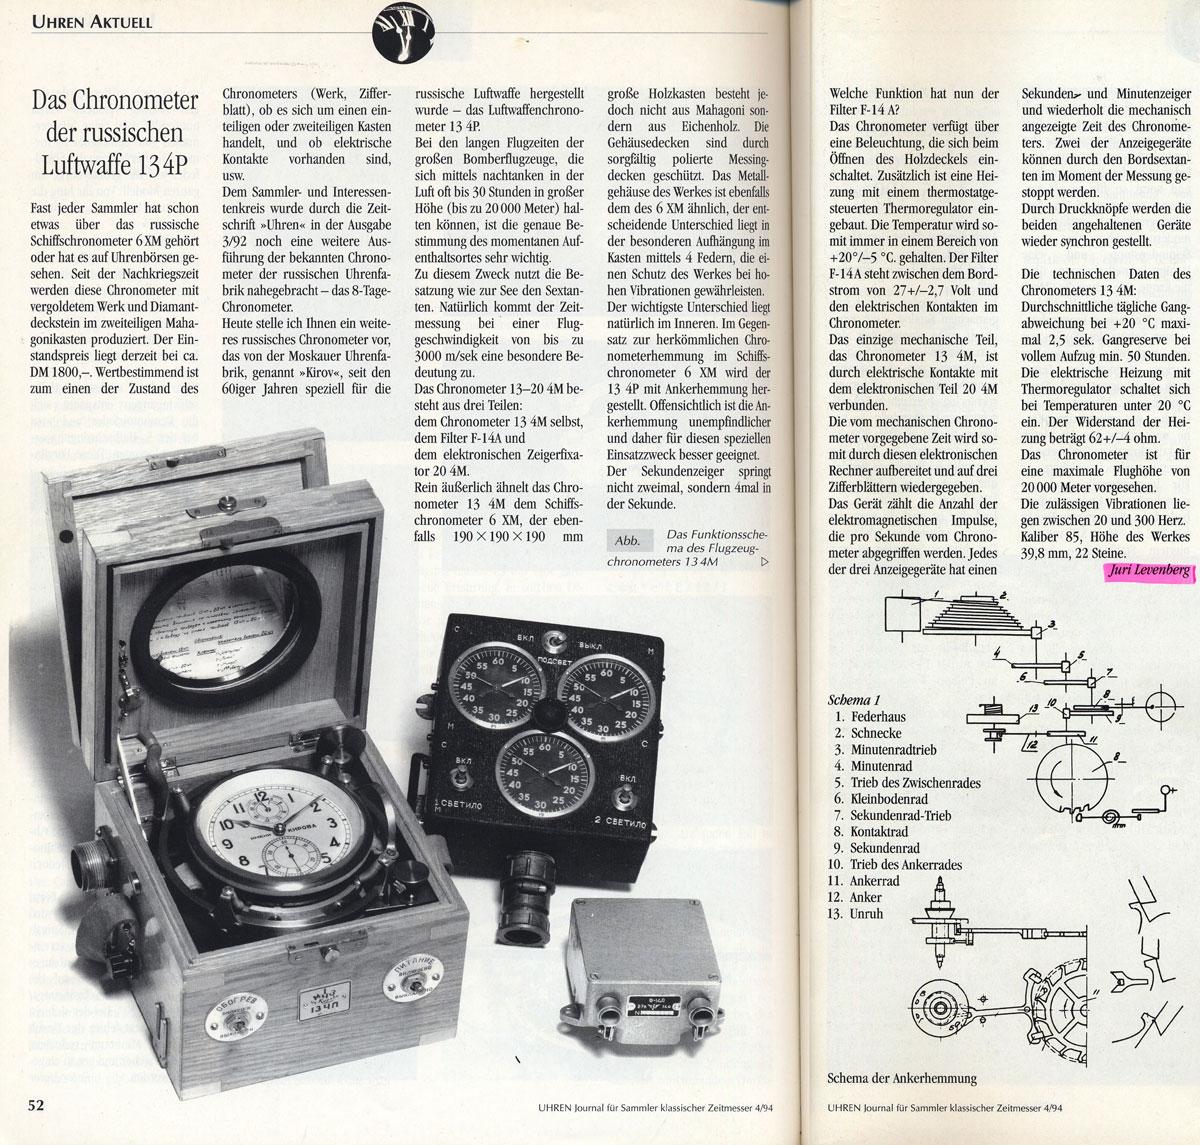 uhren 04 94 artikel juri levenberg chrono 134P UHREN Journal 4/94